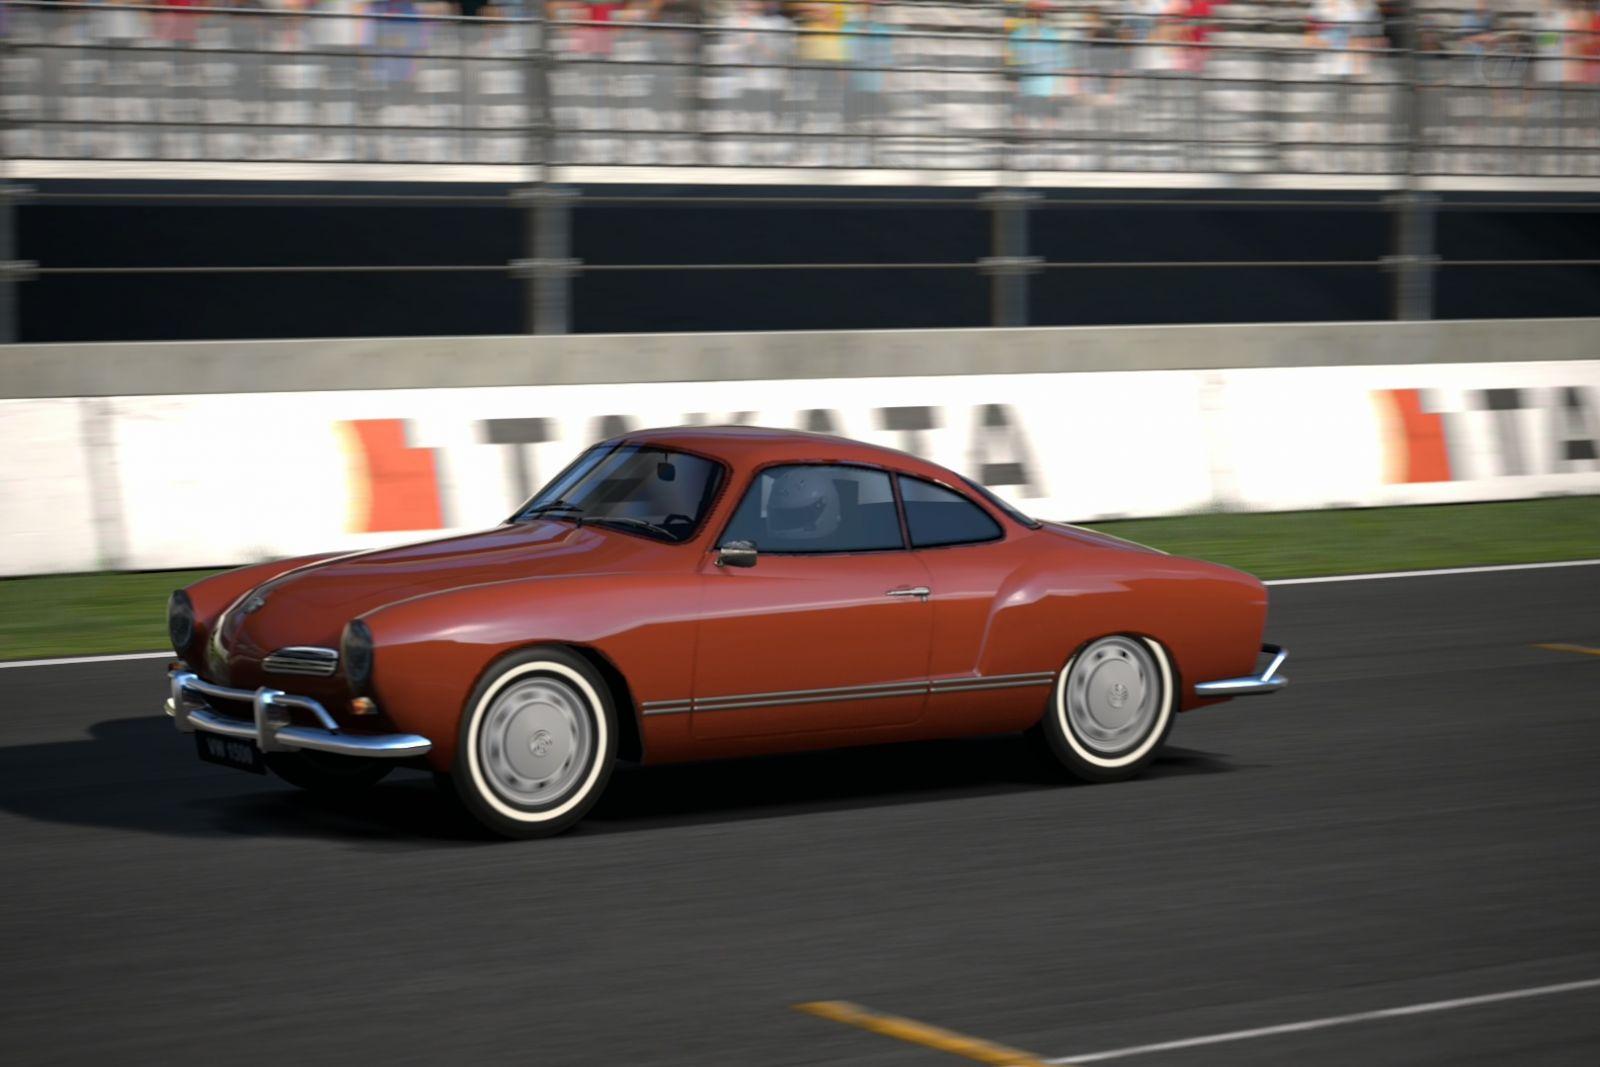 Карманн Гиа - VW Karmann Ghia - High Speed Ring 3